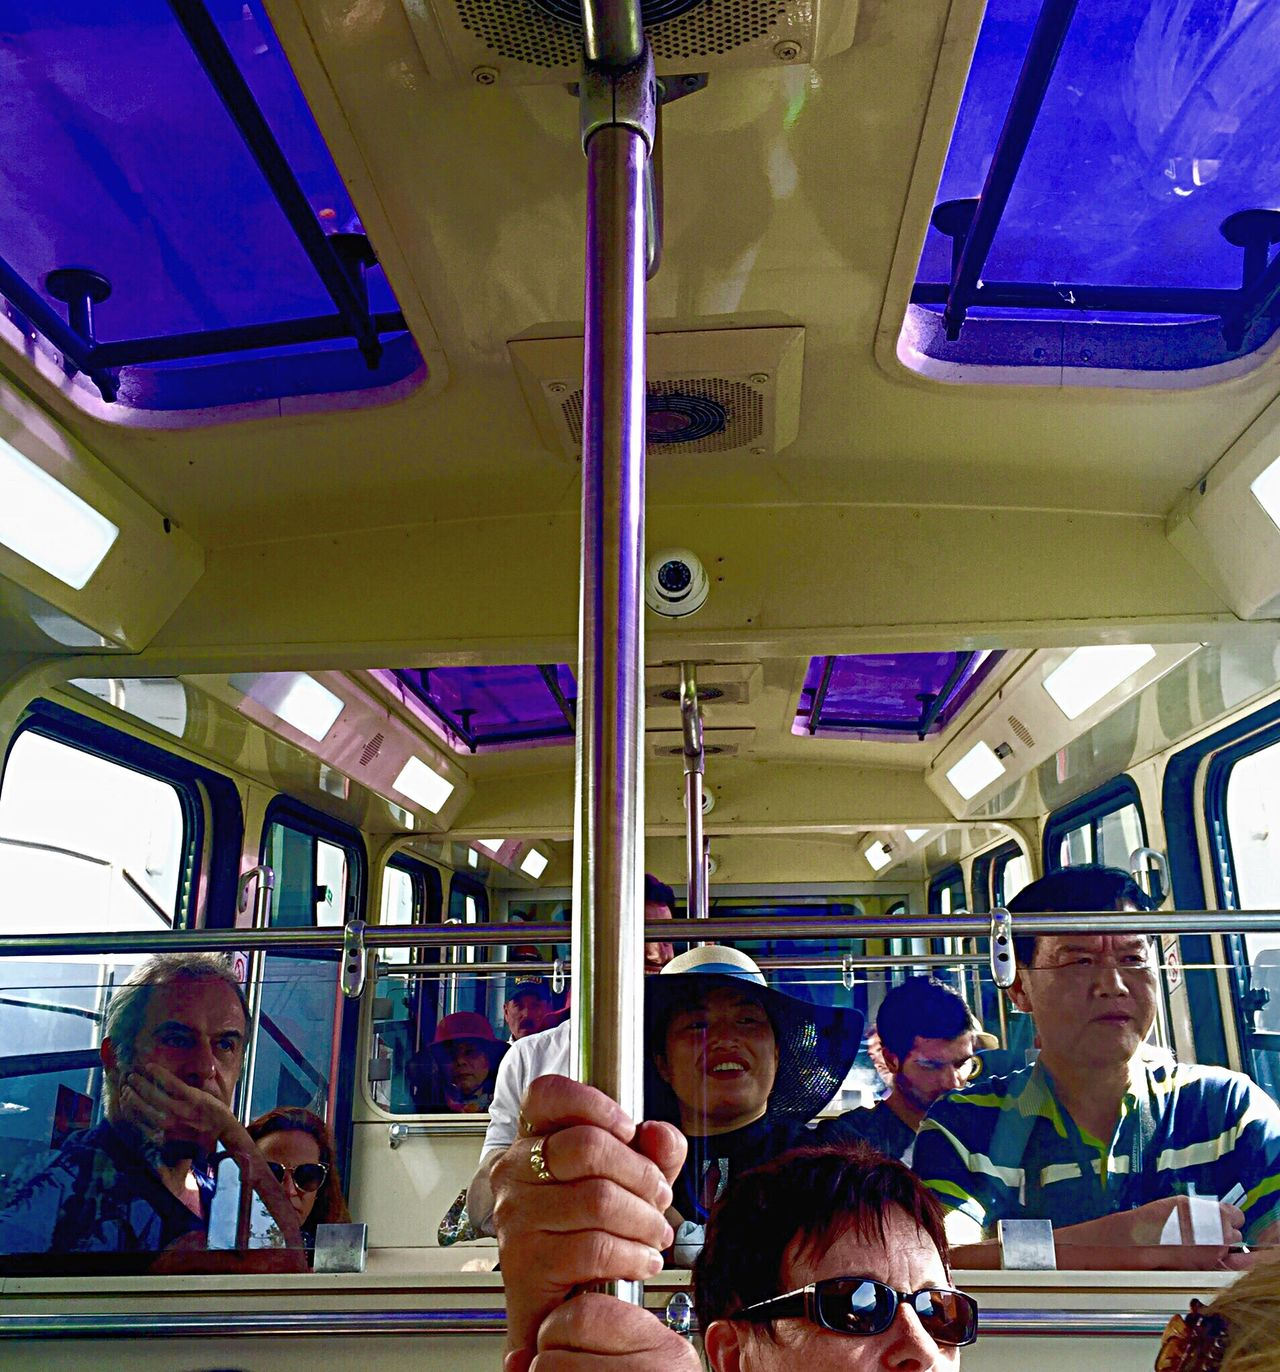 Transportation Travel Passenger Public Transportation Indoors  People EyeEm Best Shots EyeEm Gallery Eye4photography